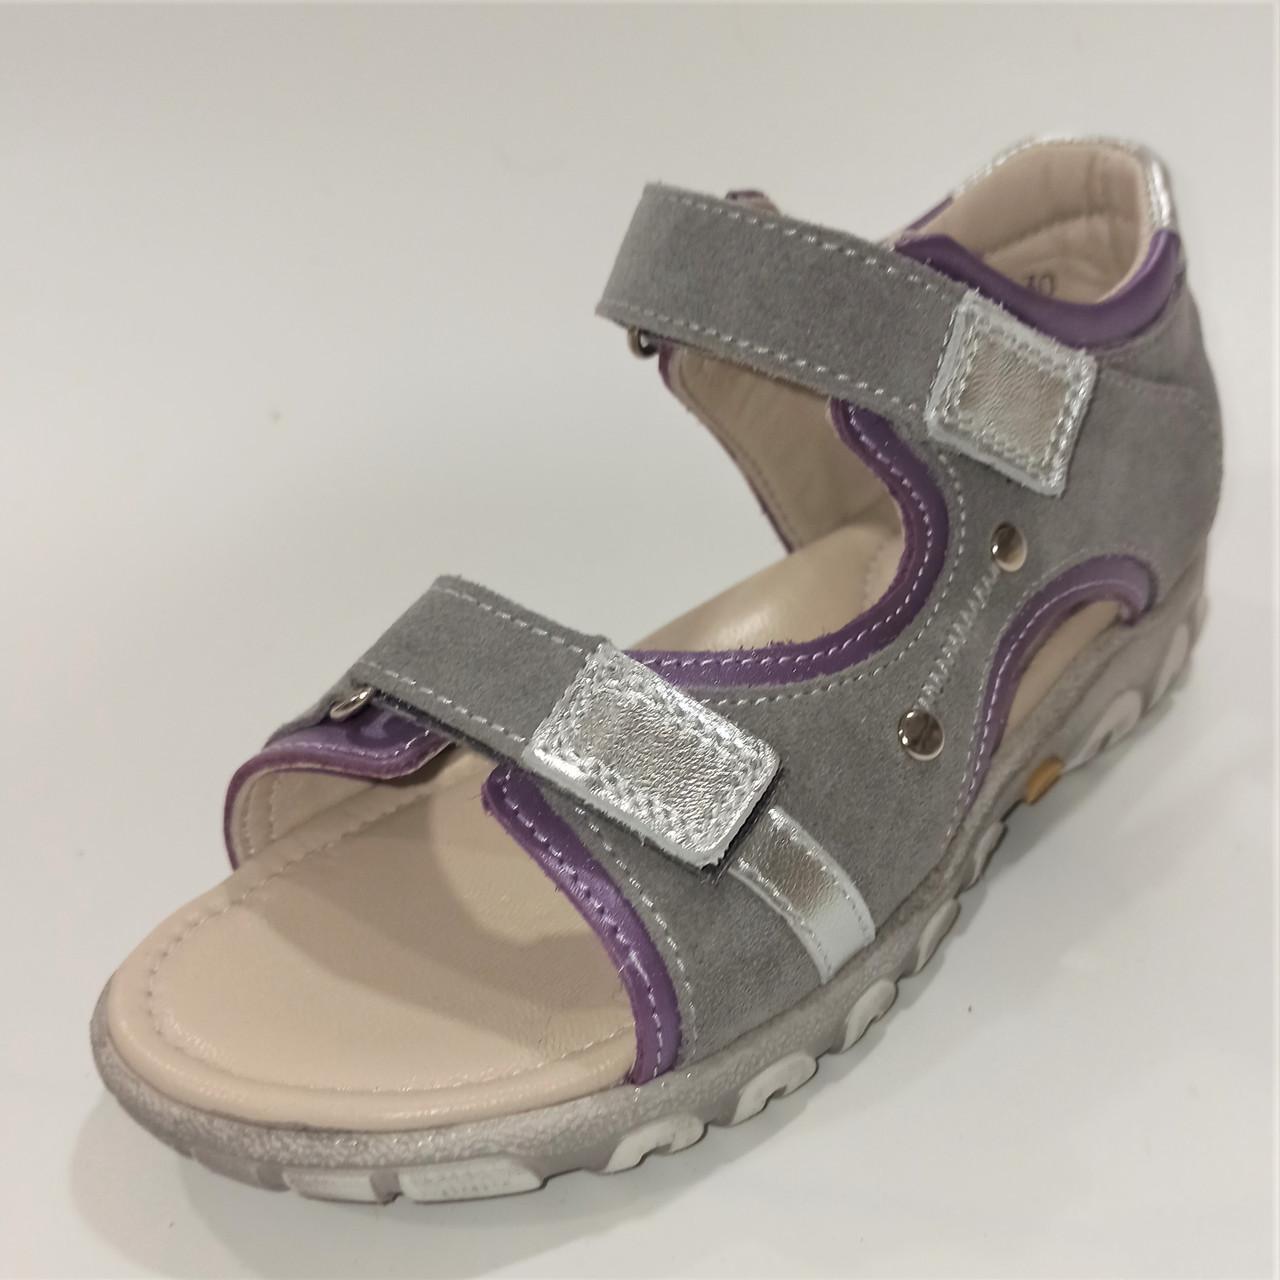 Ортопедические сандалии спорт, Orthobe (код 1231) размеры: 30-33